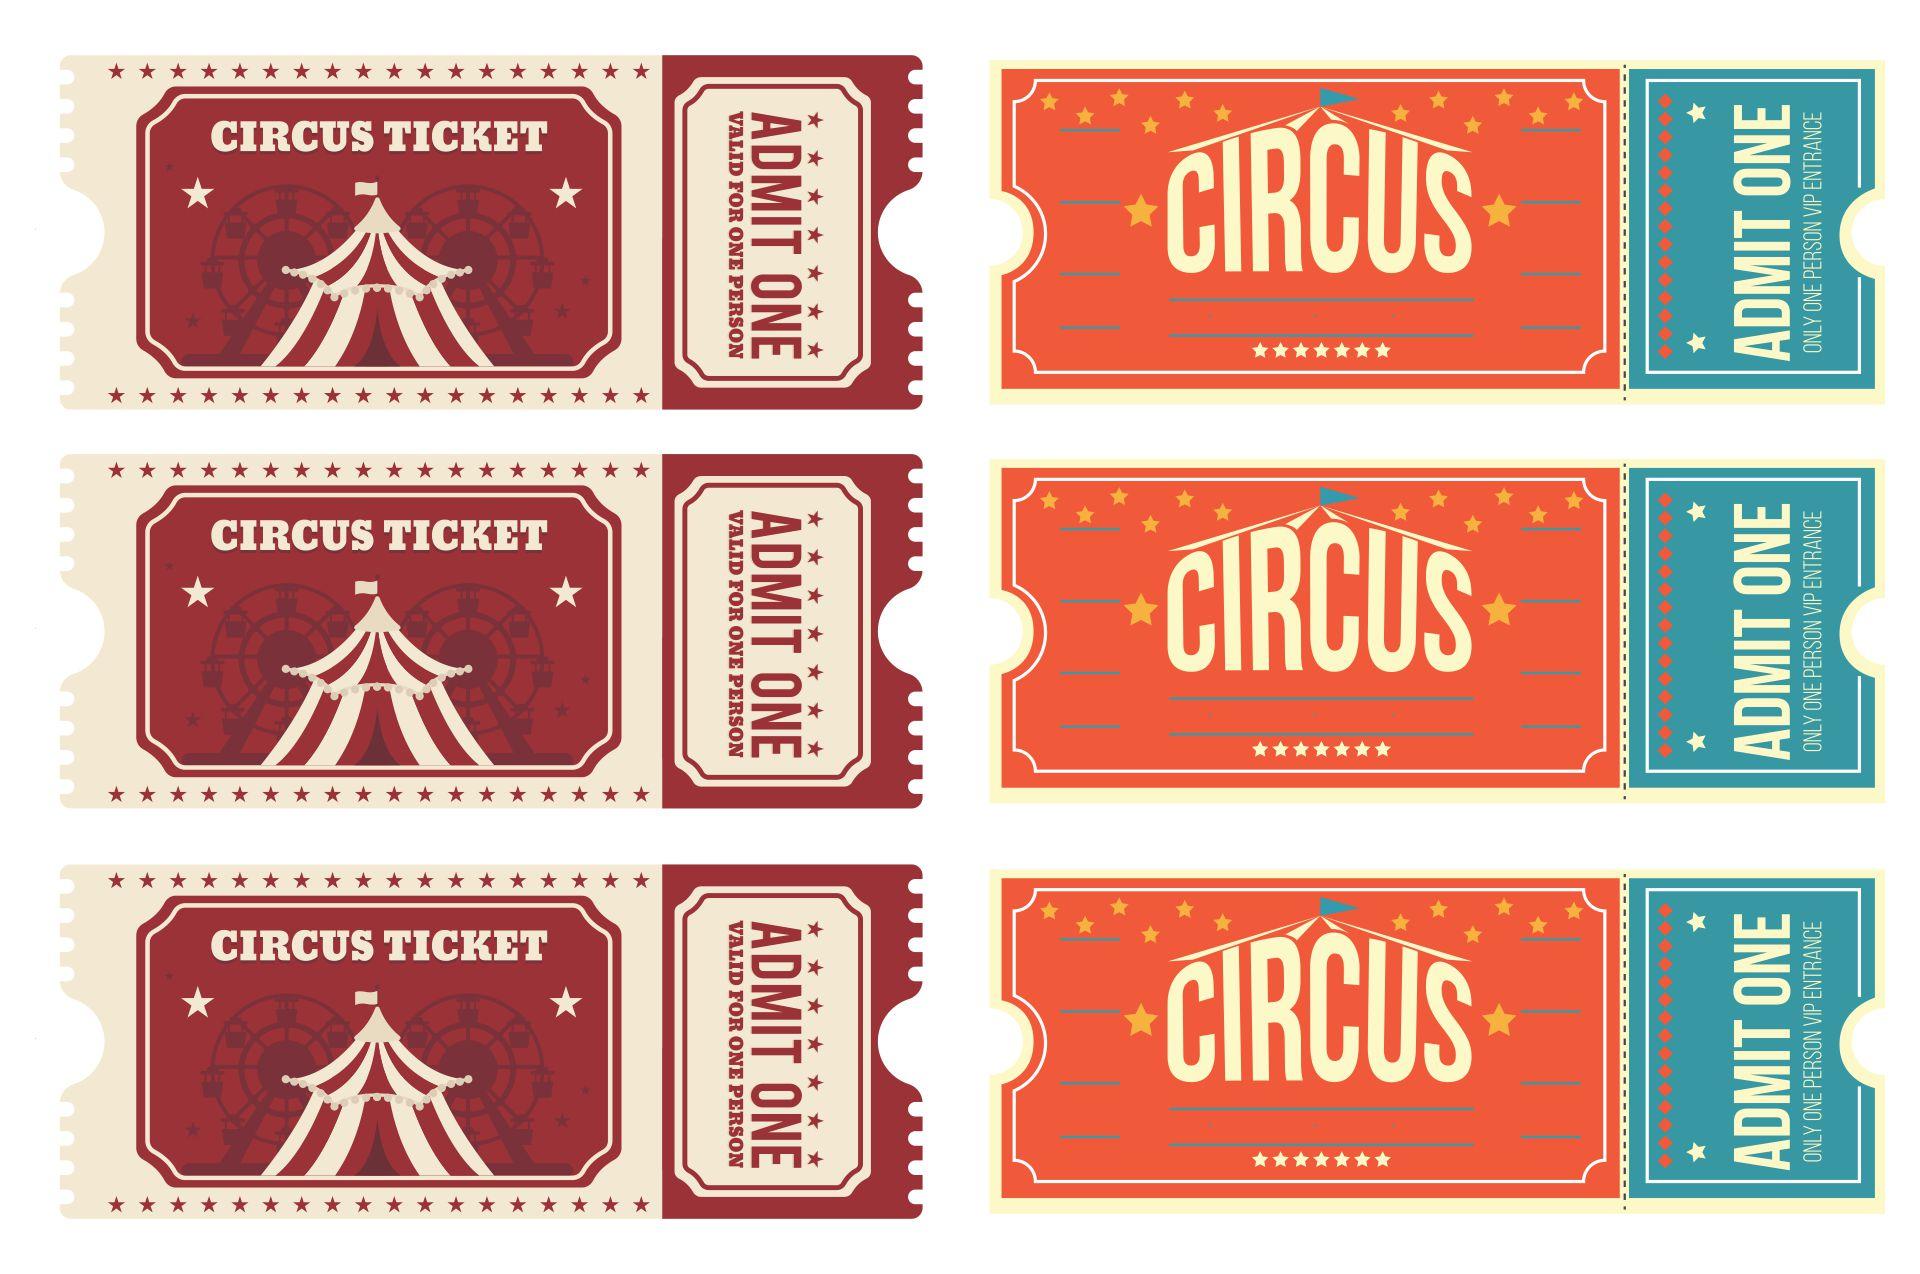 Carnival Ticket Design Template